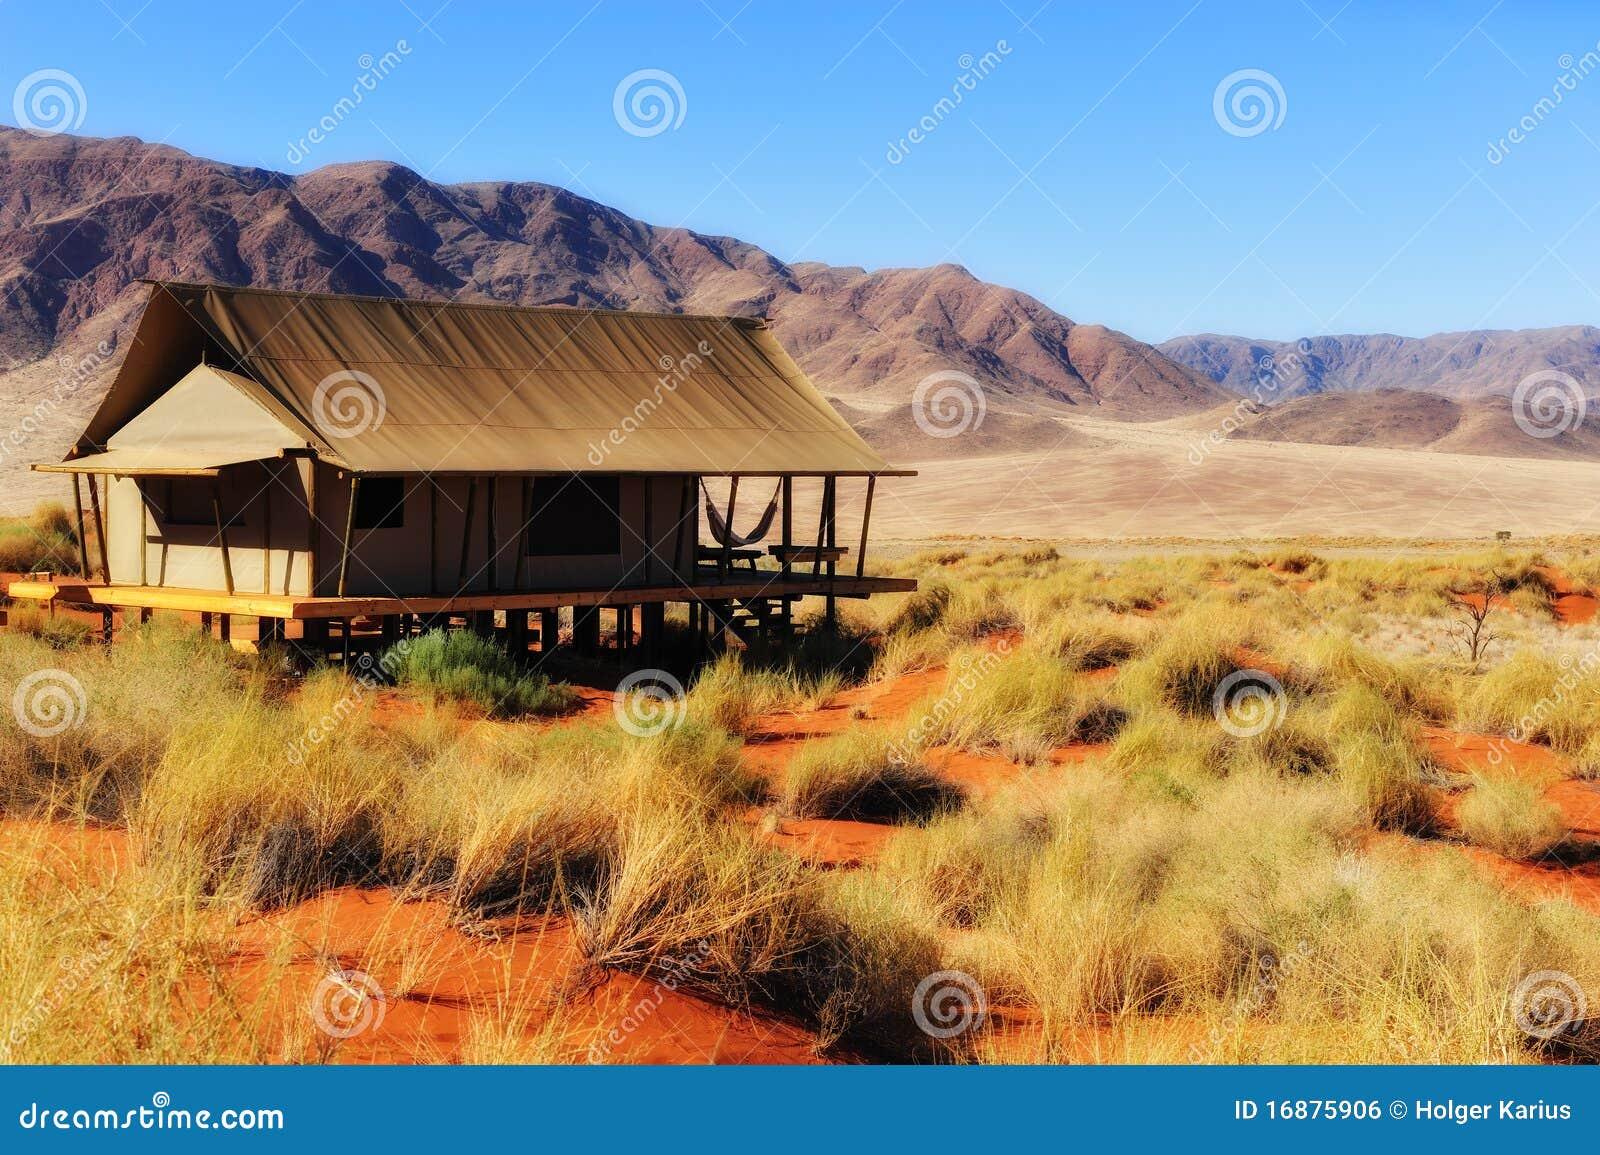 Safari Tent in the Namib Desert (Namibia)